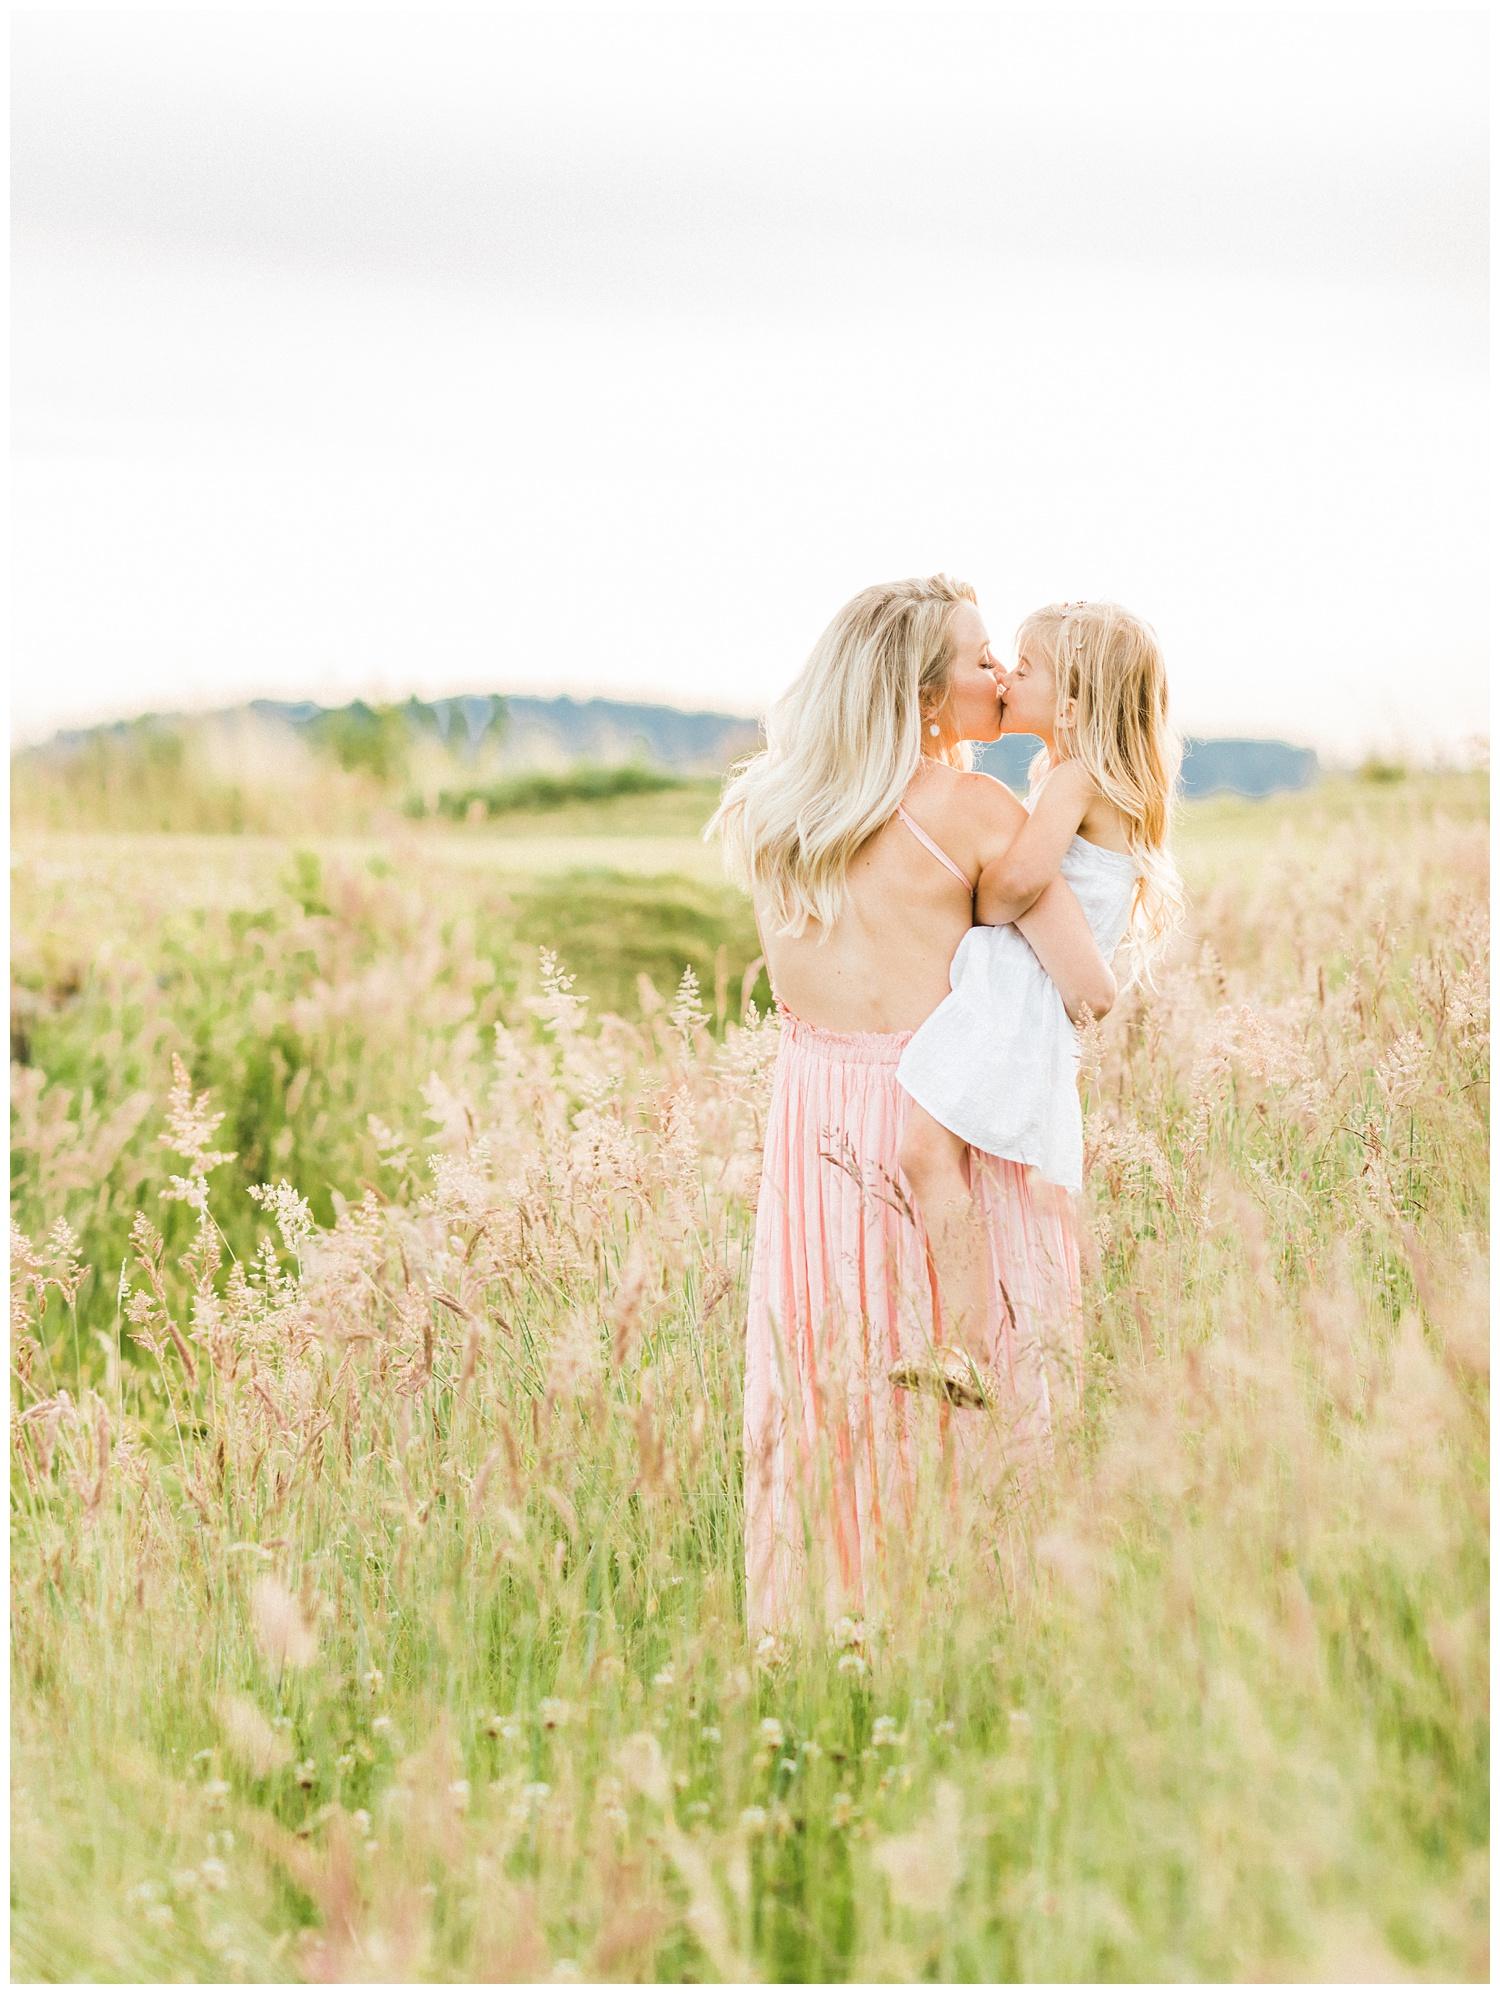 washginton-family-photographer_046.jpg